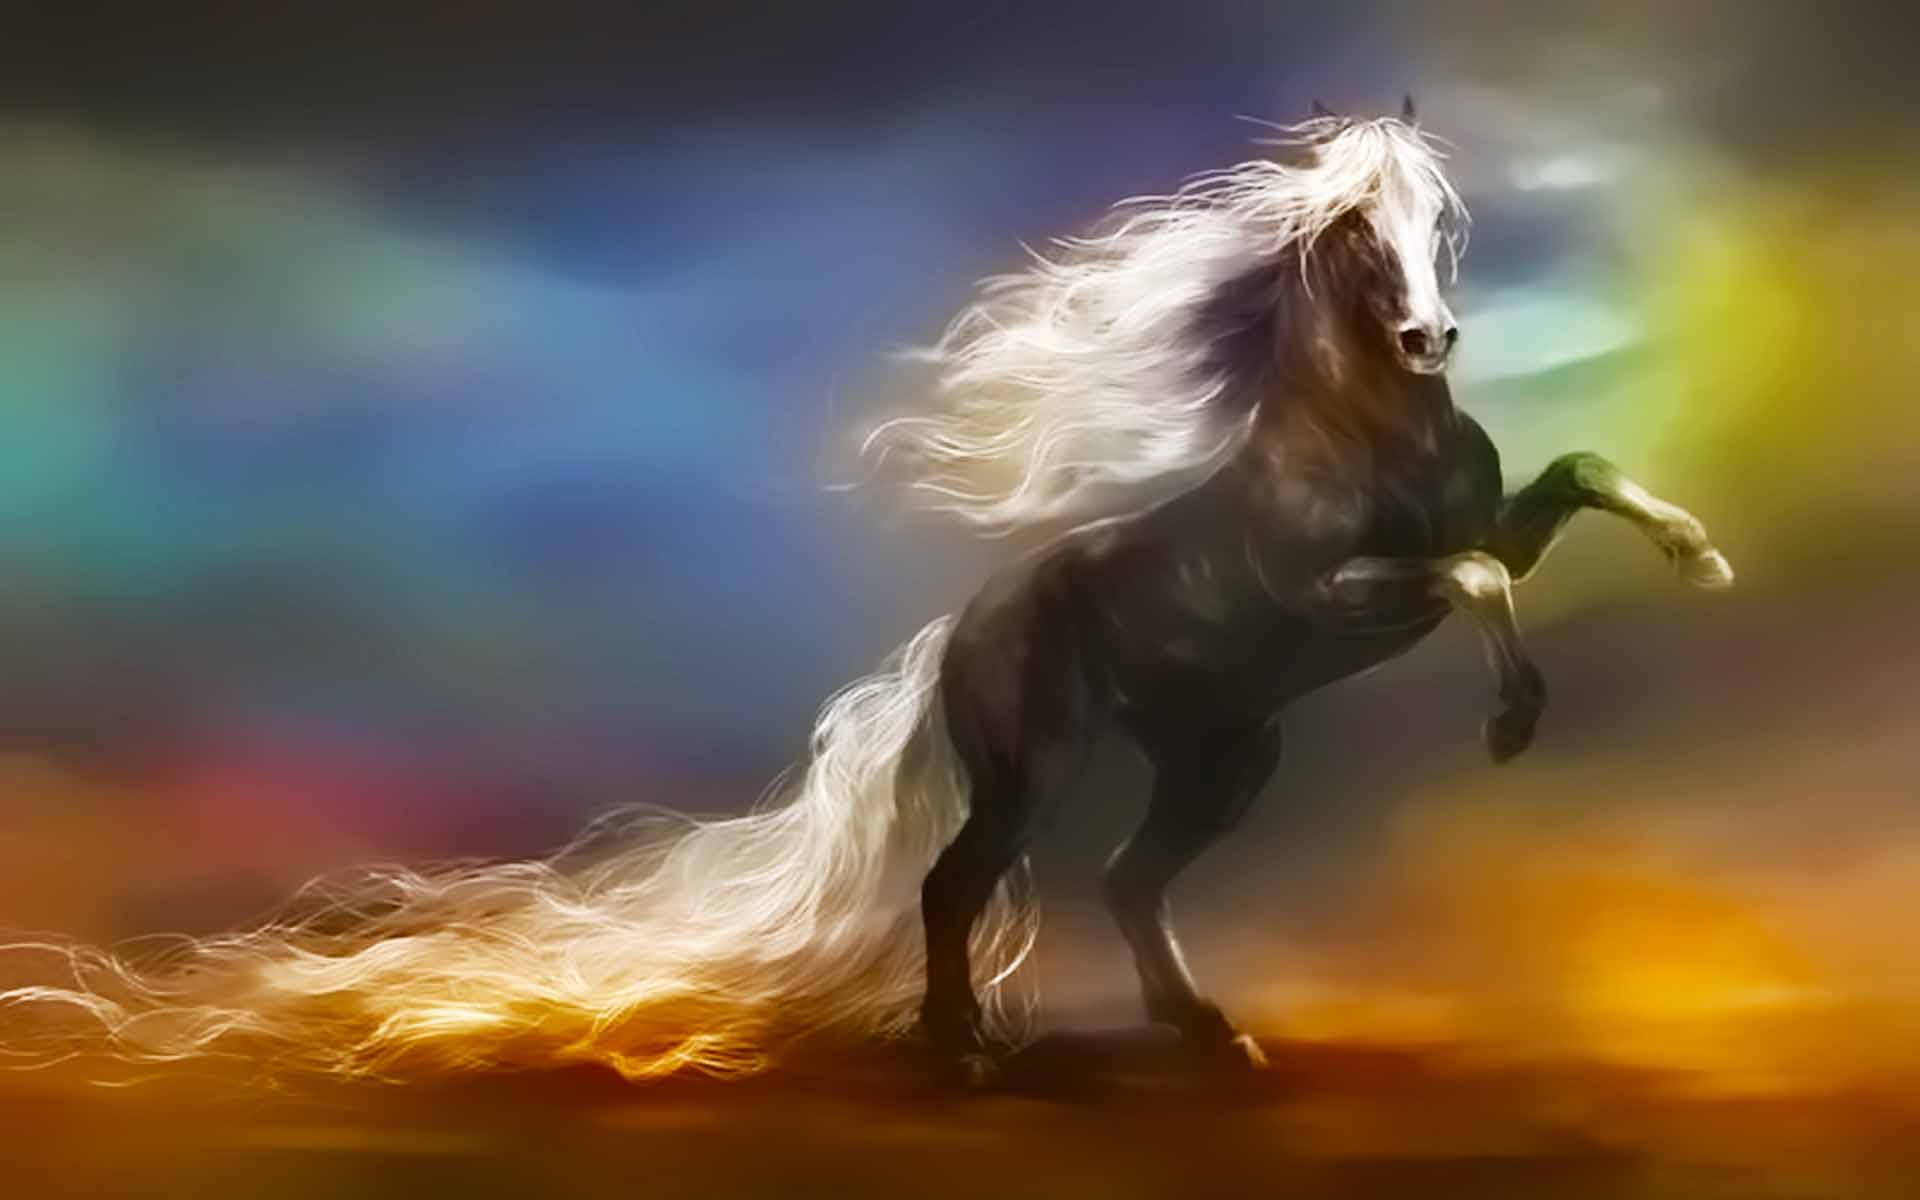 3d Horse Images Hd 1920x1200 Wallpaper Teahub Io